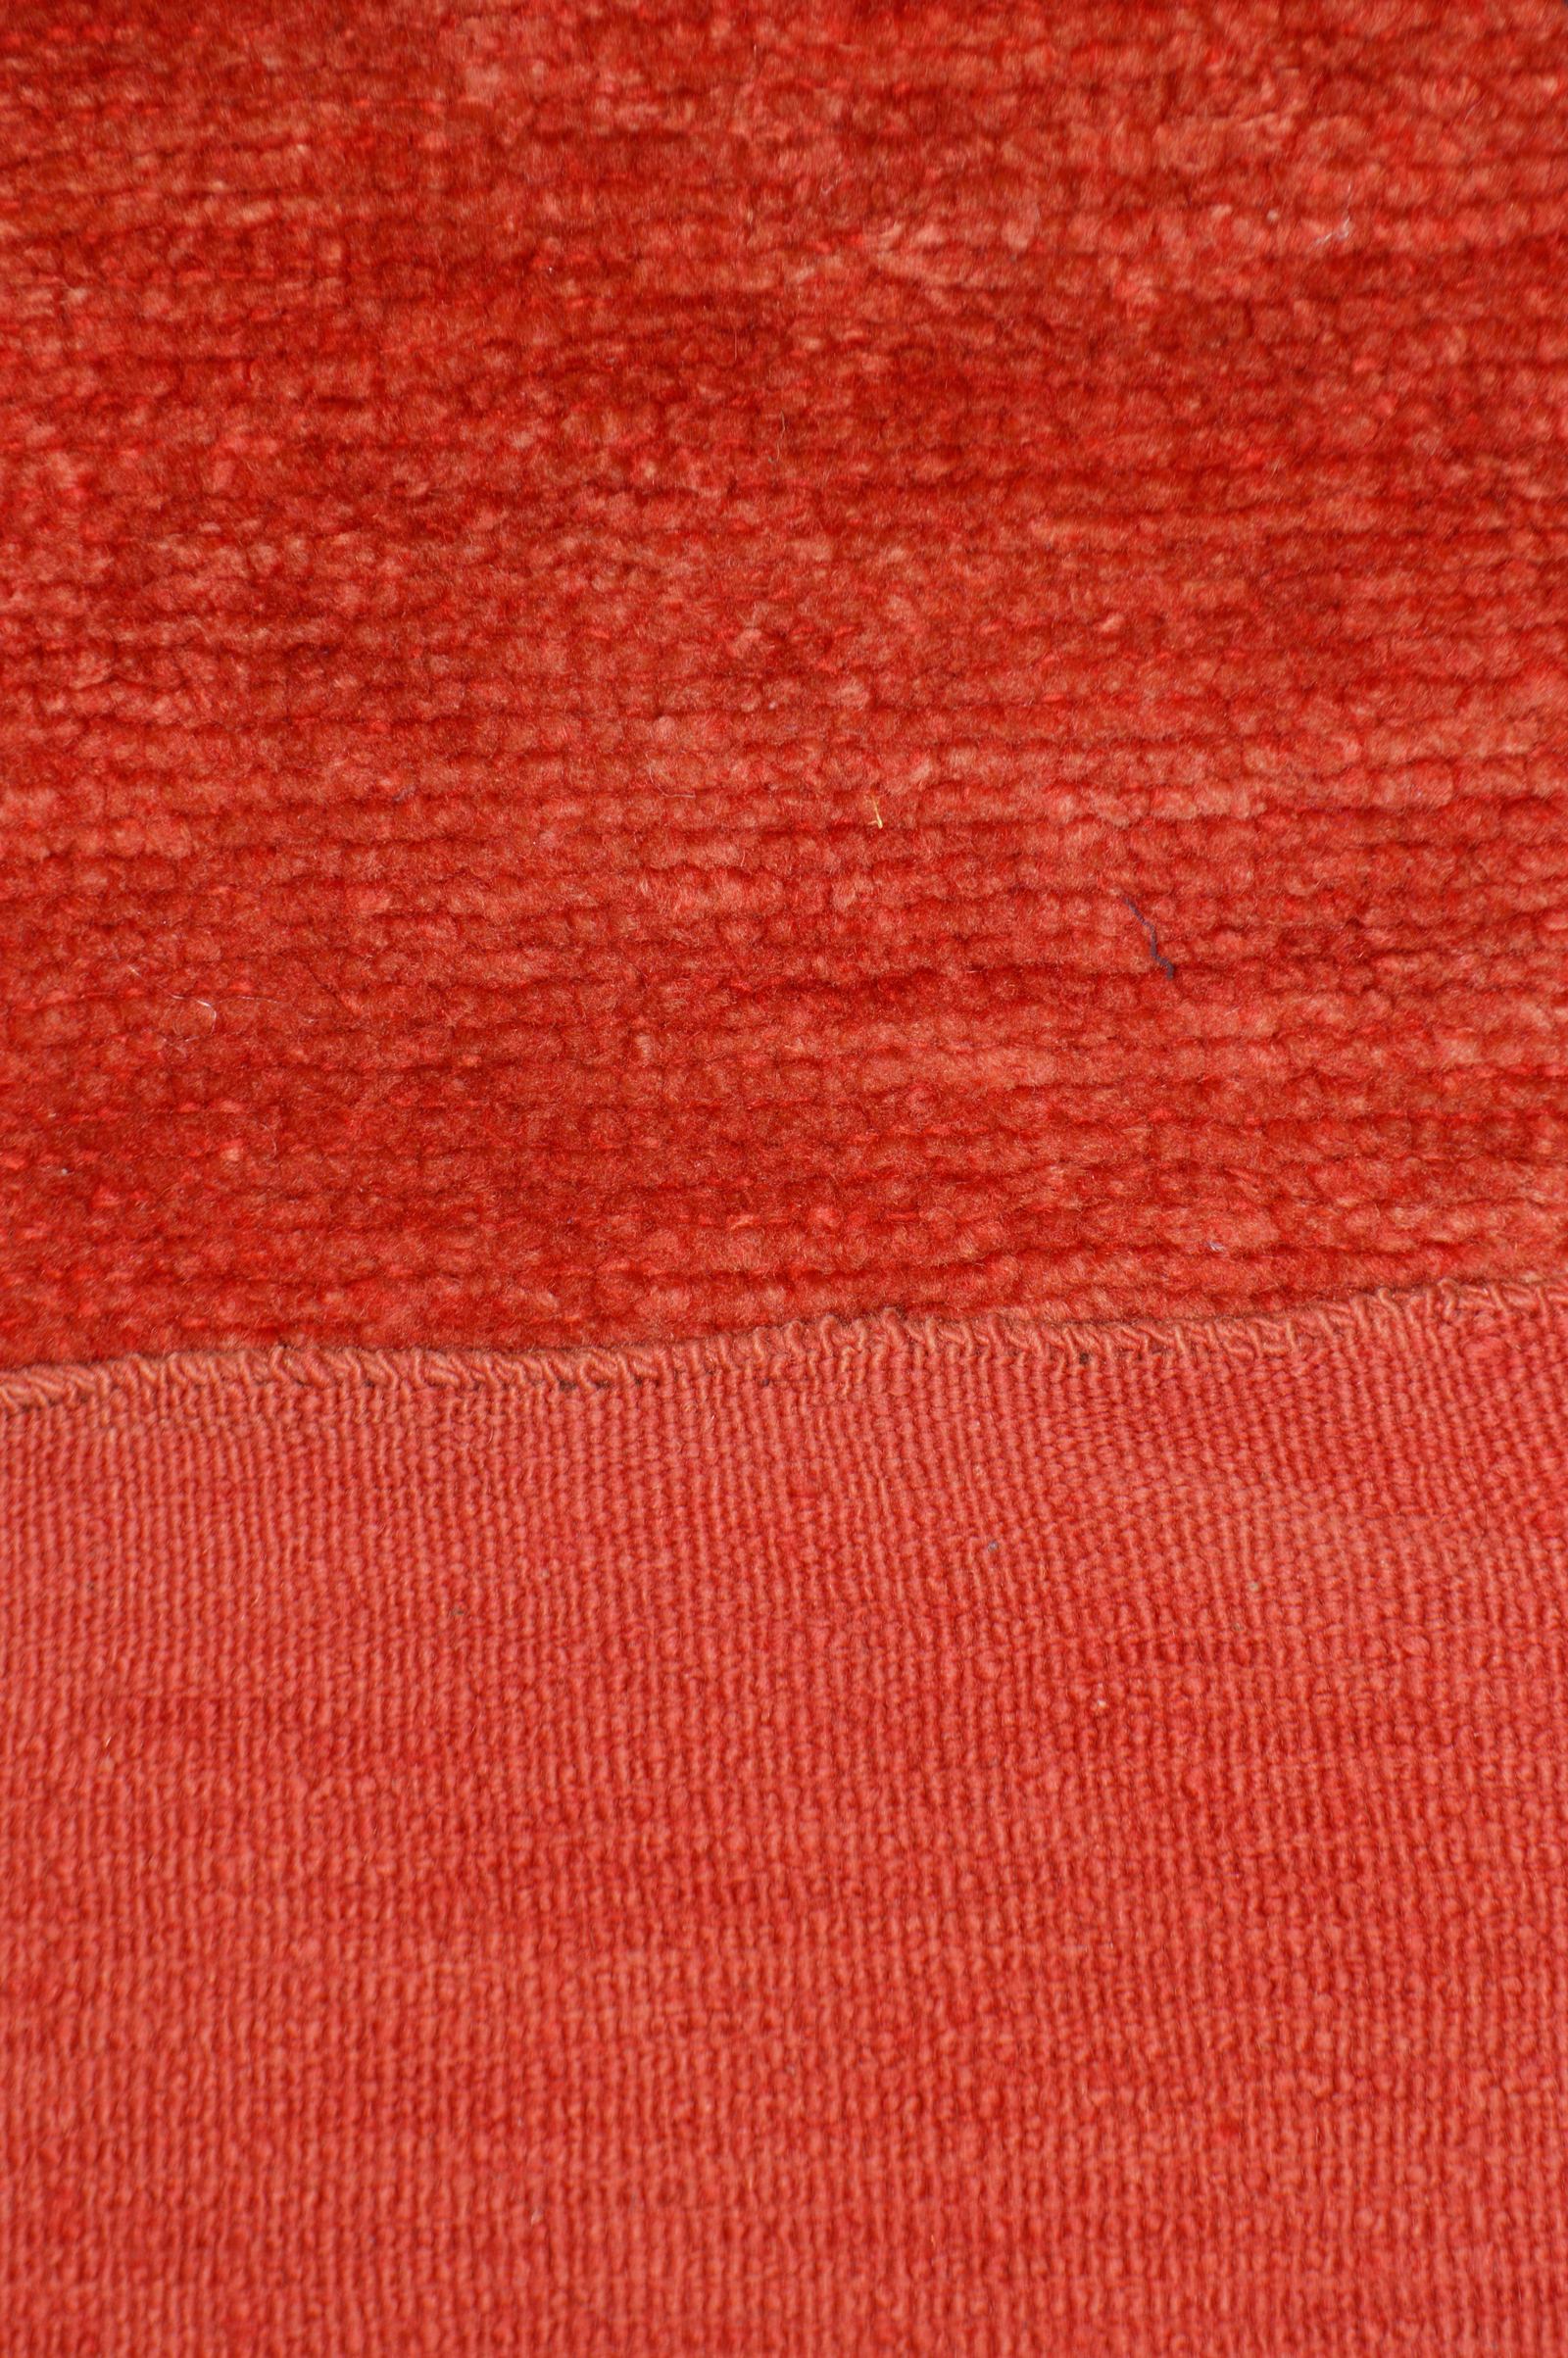 Mrirt TN 0103 /  195 x 106 cm